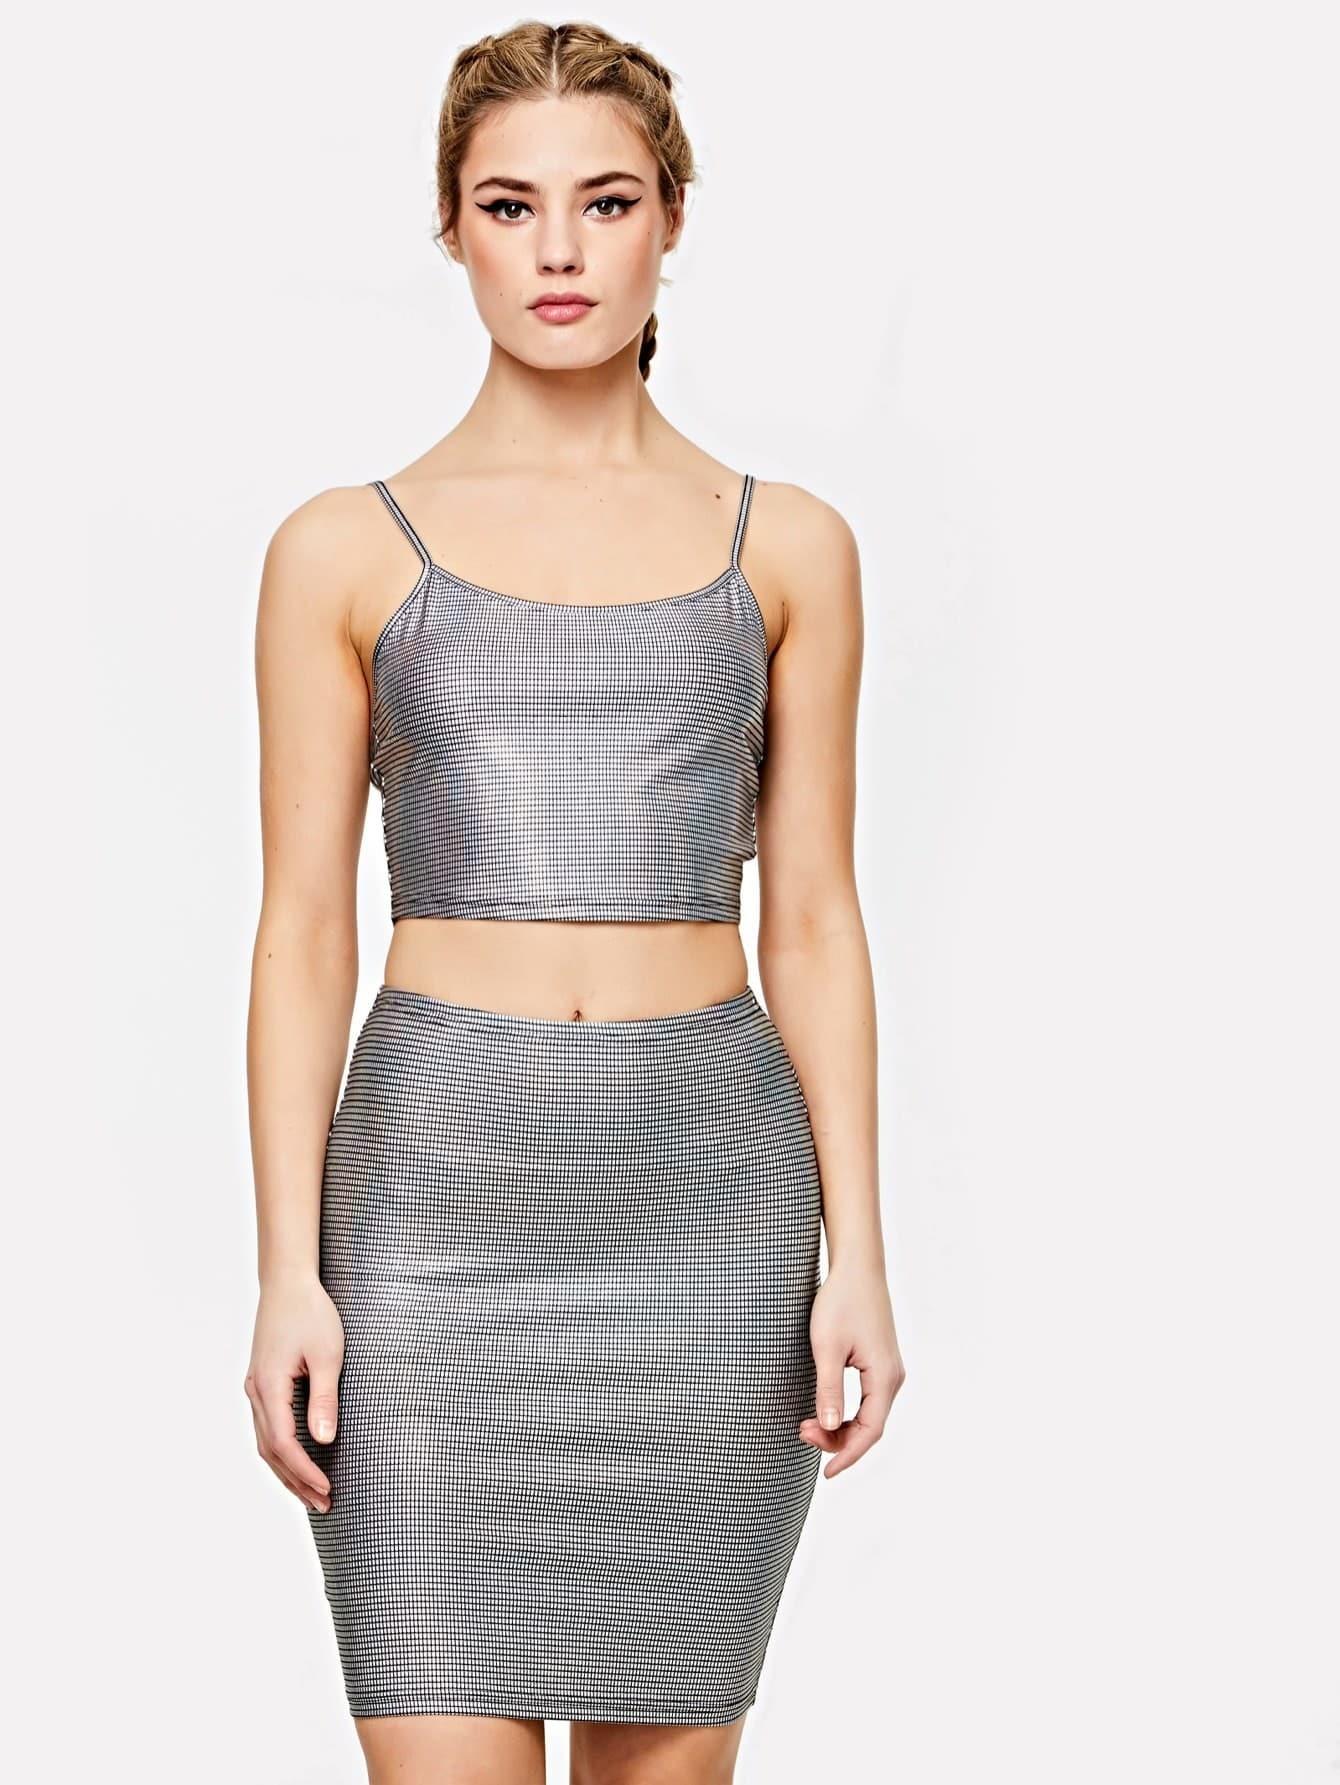 Metallic Crop Cami Top & Skirt Set christine darvin new ego men